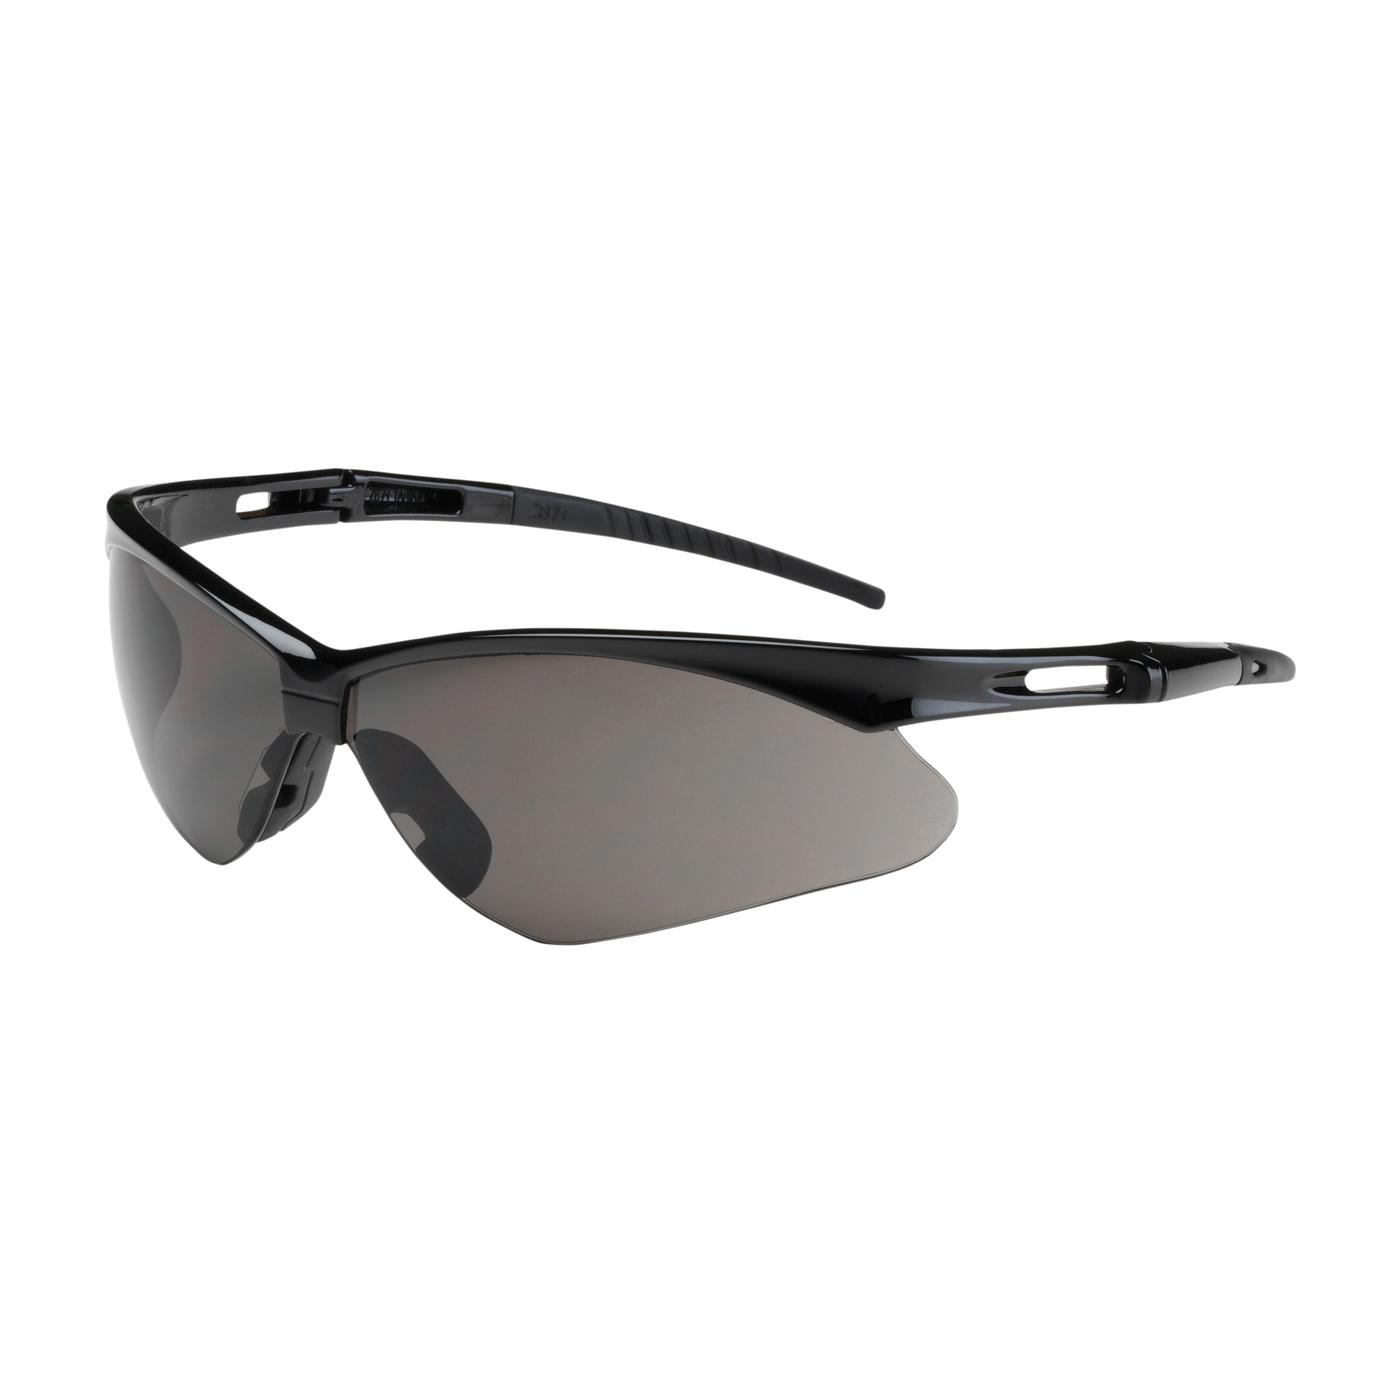 Bouton® 250-AN-10126 Anser™ 250-AN Dual Lens Safety Glasses With Adjustable Neck Cord, Anti-Fog, Gray Lens, Semi-Rimless Frame, Black, Polycarbonate Frame, Polycarbonate Lens, ANSI Z87.1+, CSA Z94.3